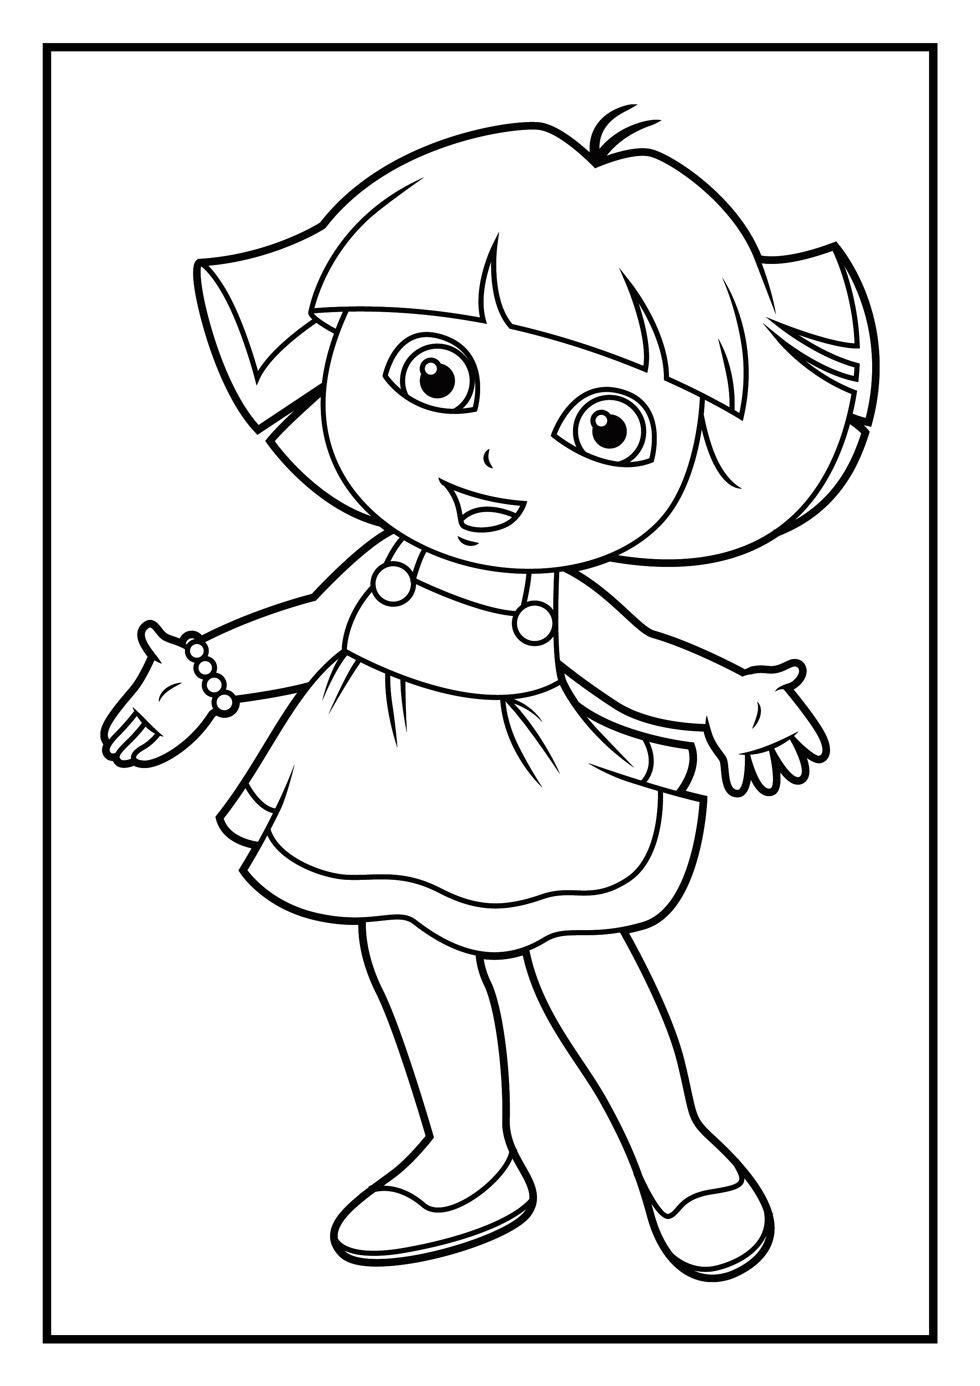 Dora Colouring Pictures Dora Coloring Cartoon Coloring Pages Coloring Pages